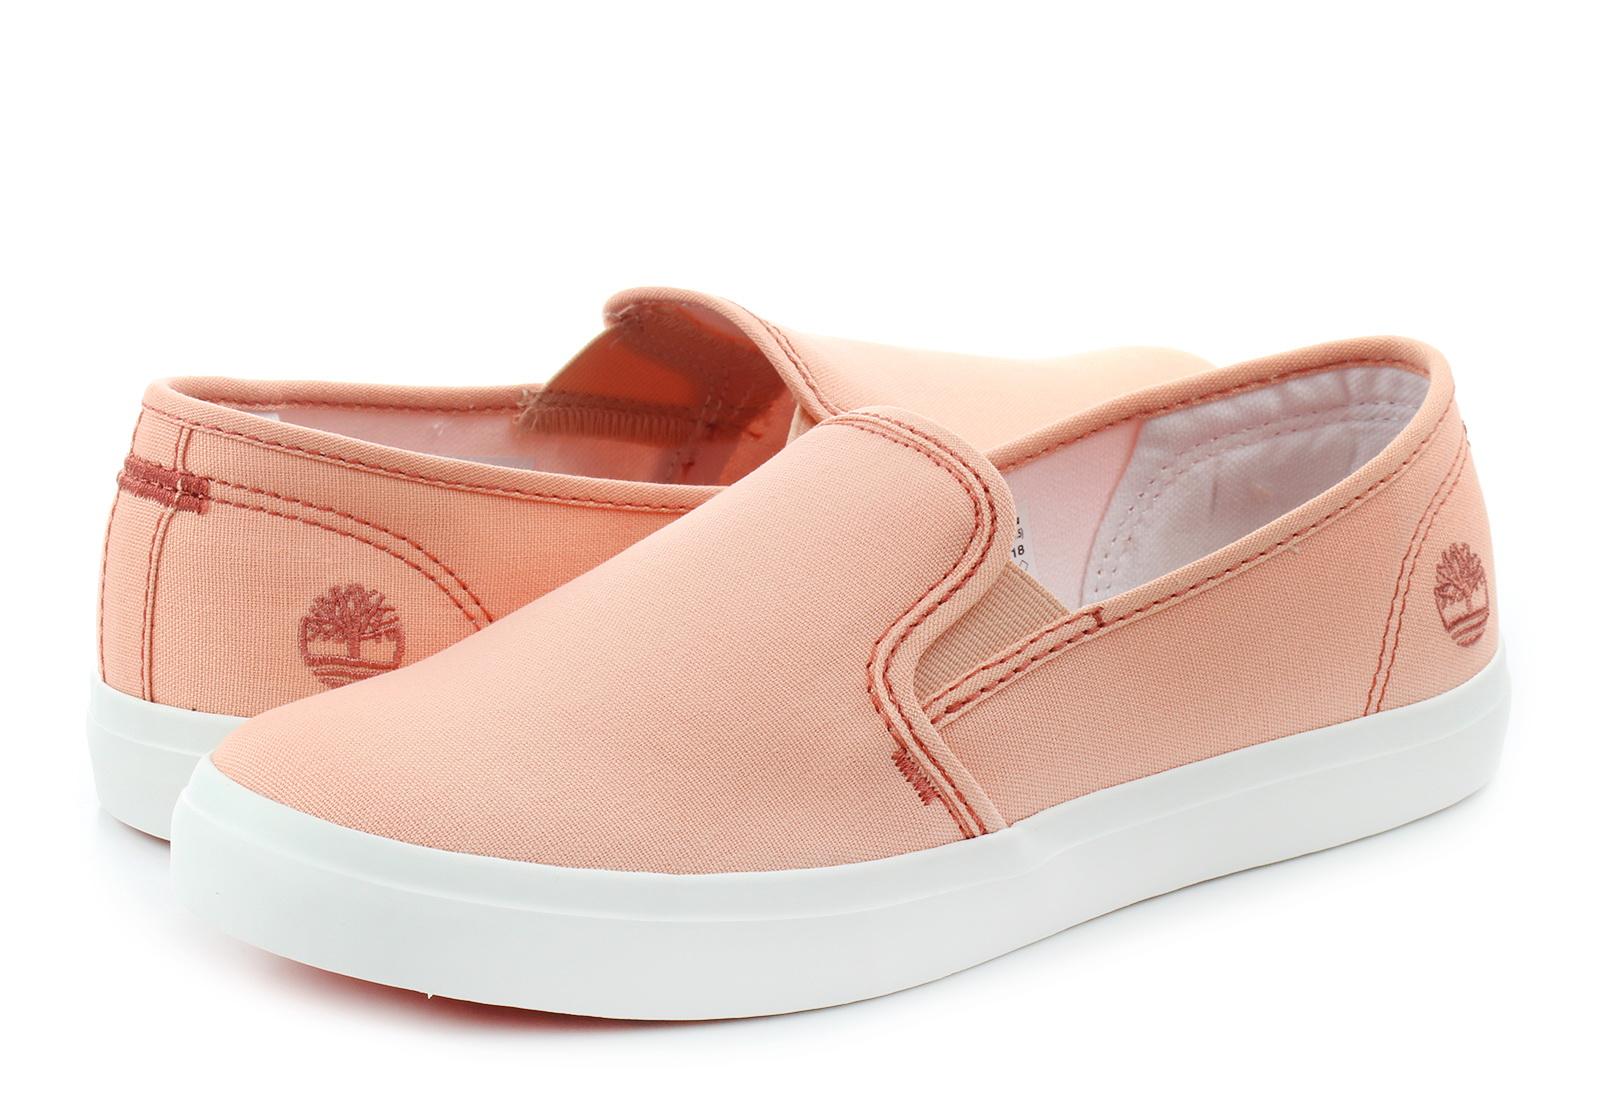 Timberland Shoes Newport Slip On